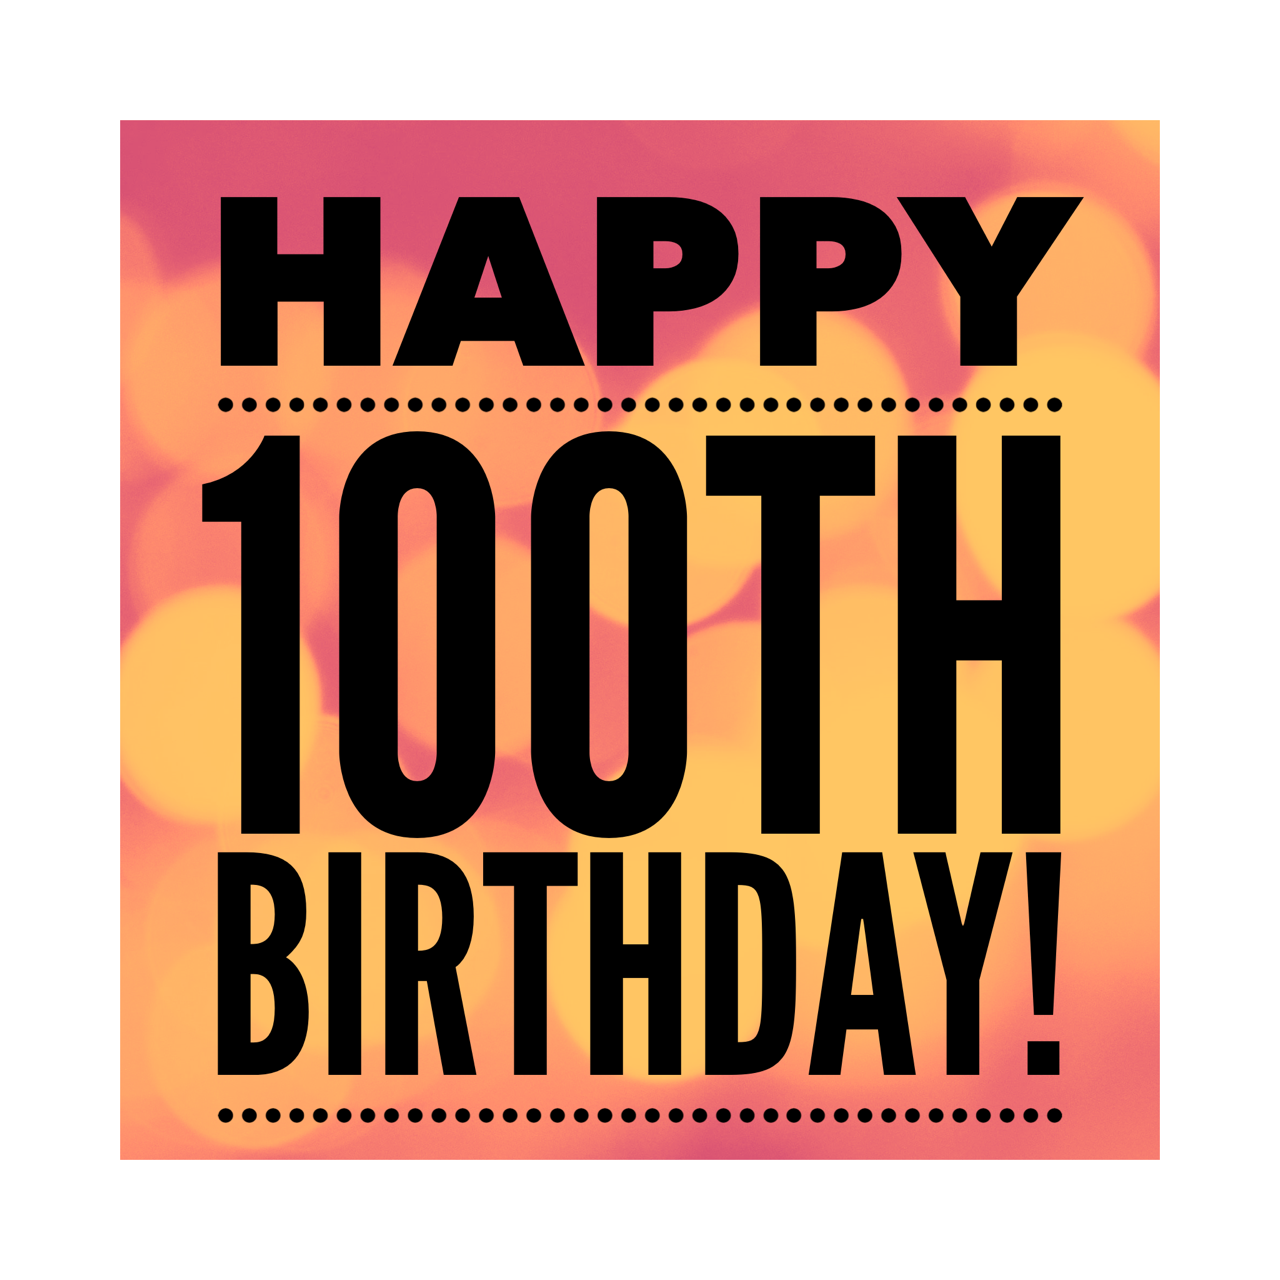 Happy 100th Birthday text